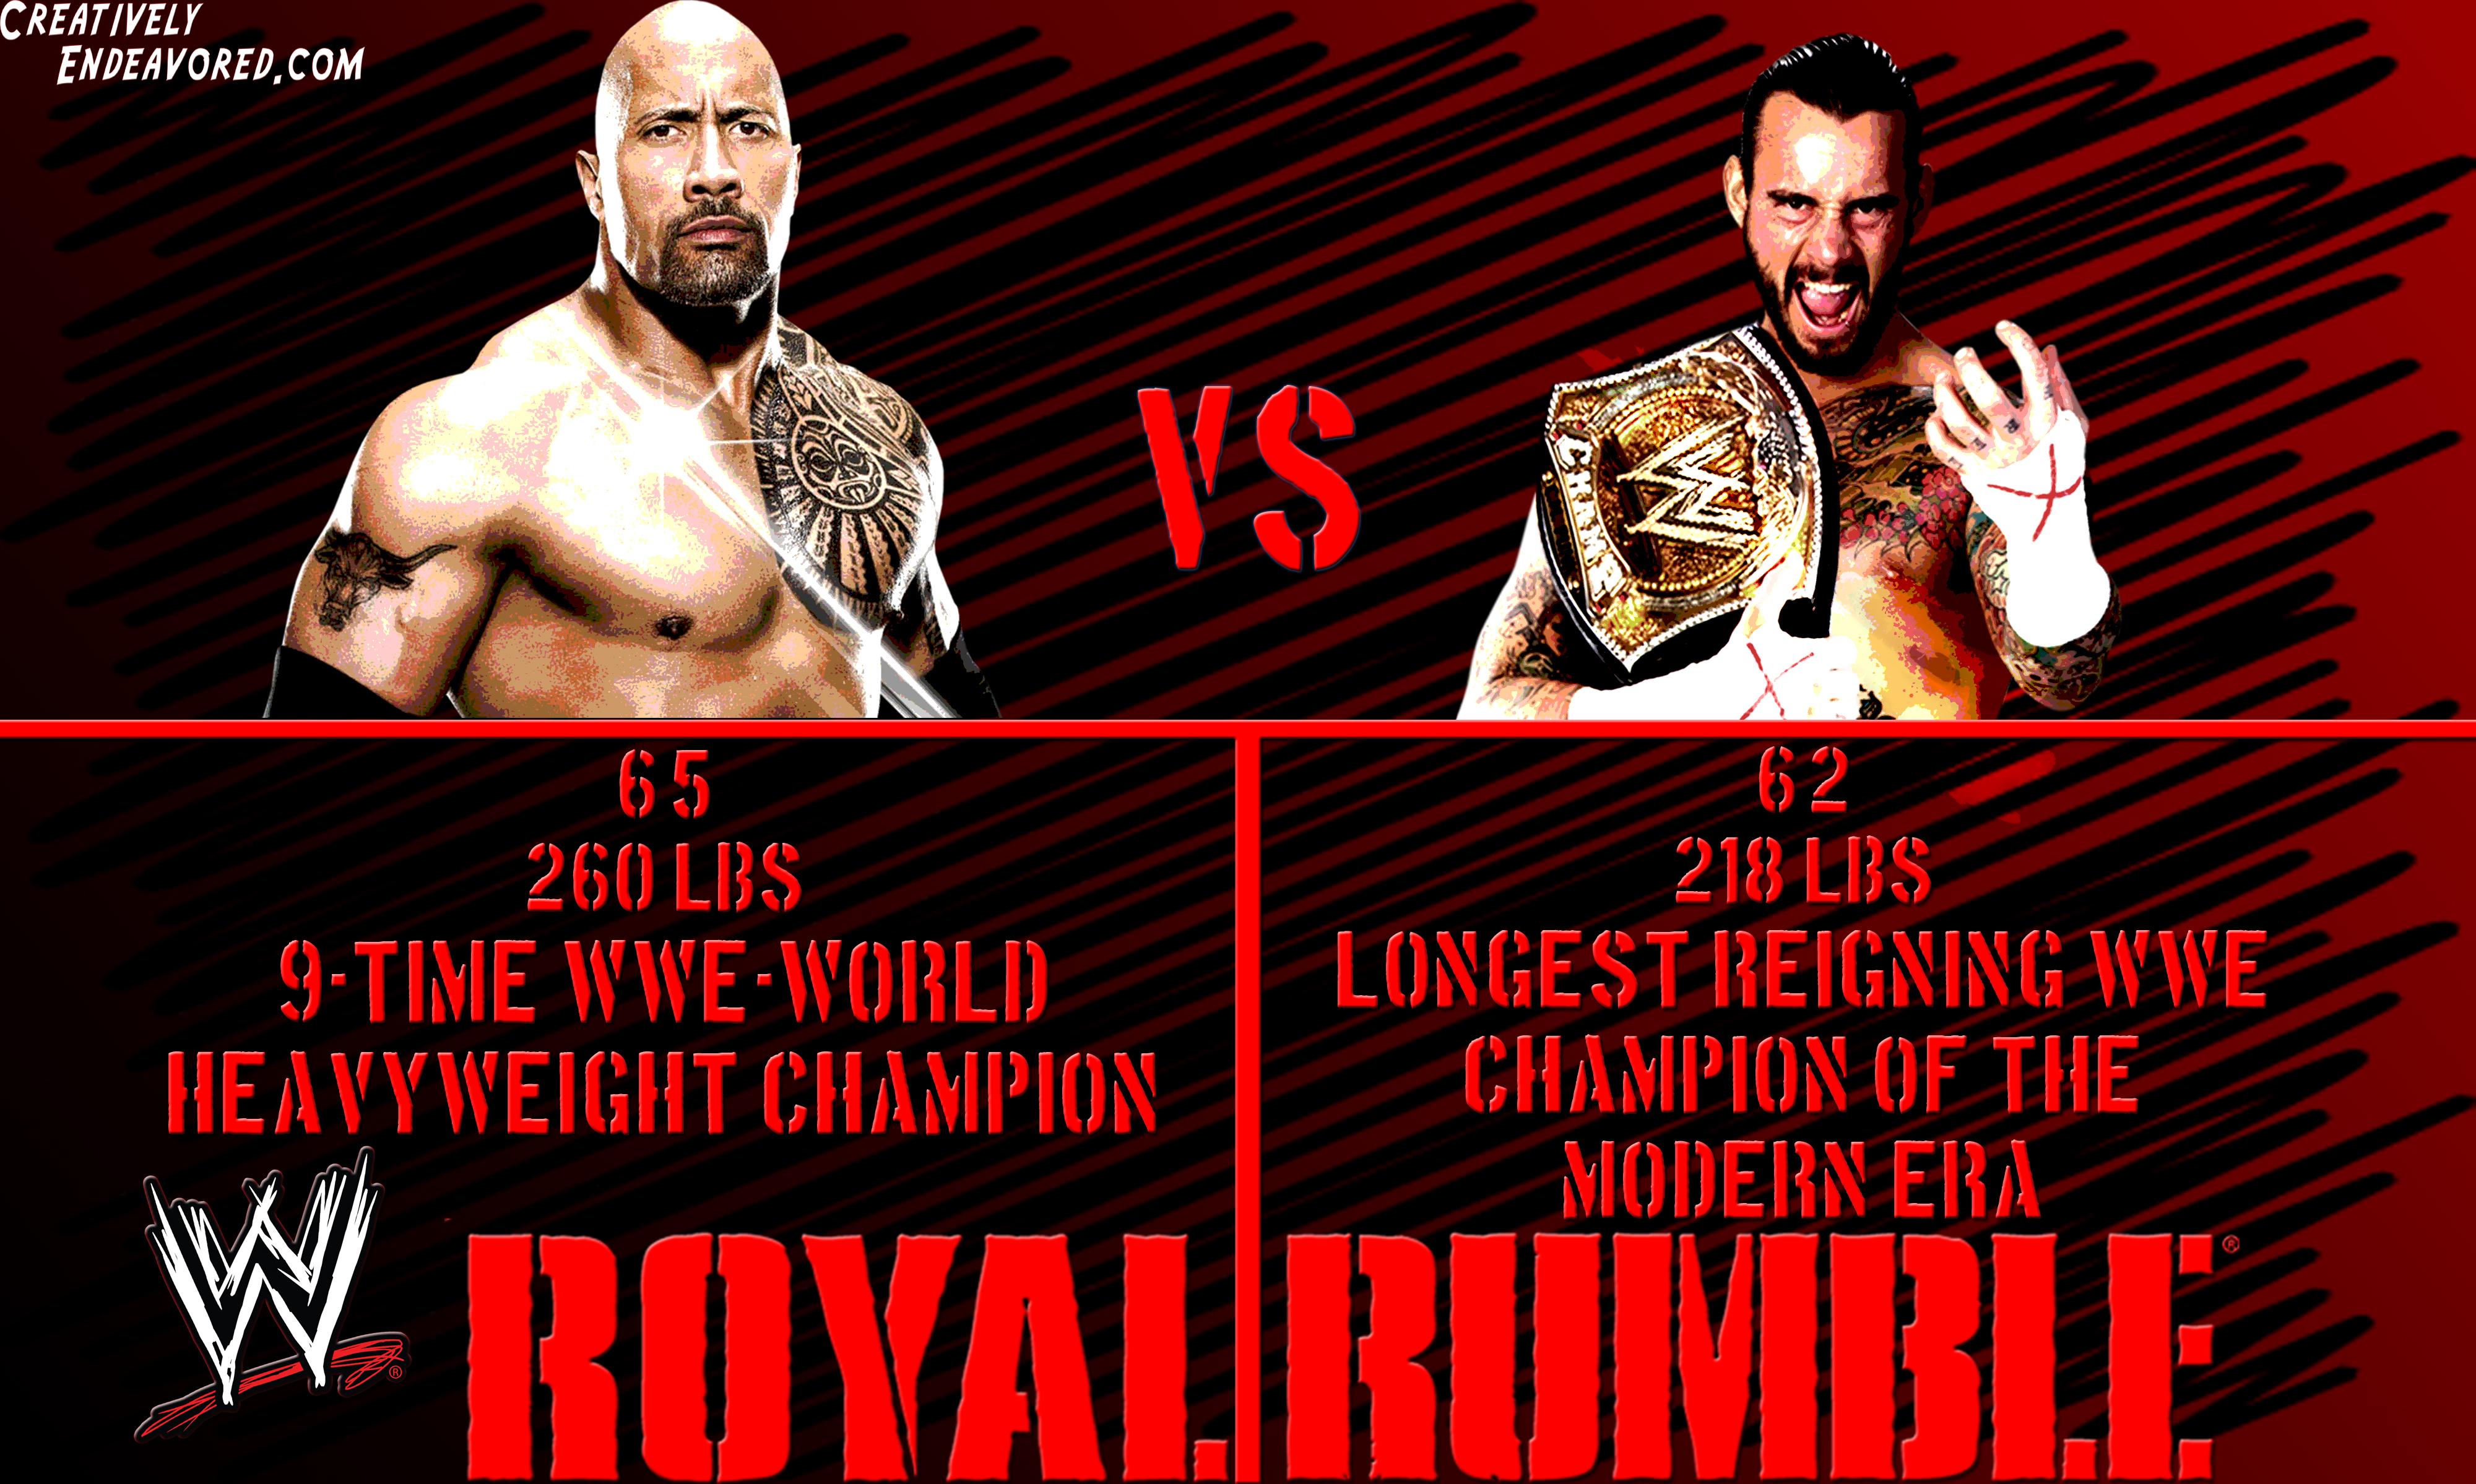 Wallpaper Wednesday Cm Punk Vs The Rock At Wwe Royal Rumble 2013